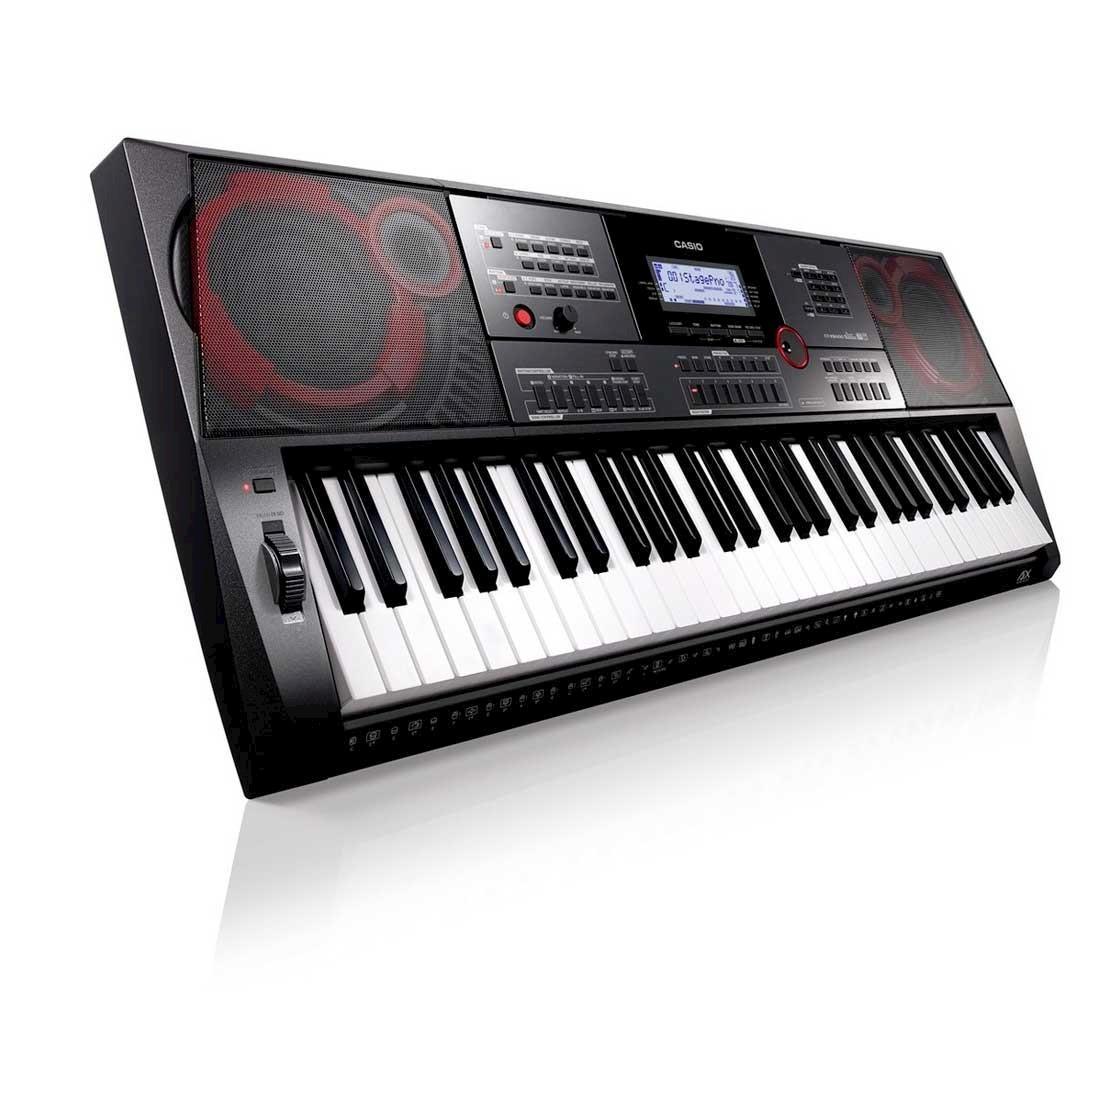 8a0822d3ae2 Casio CT-X5000 Teclado Casio 61 teclas - Teclado Musical - Magazine ...